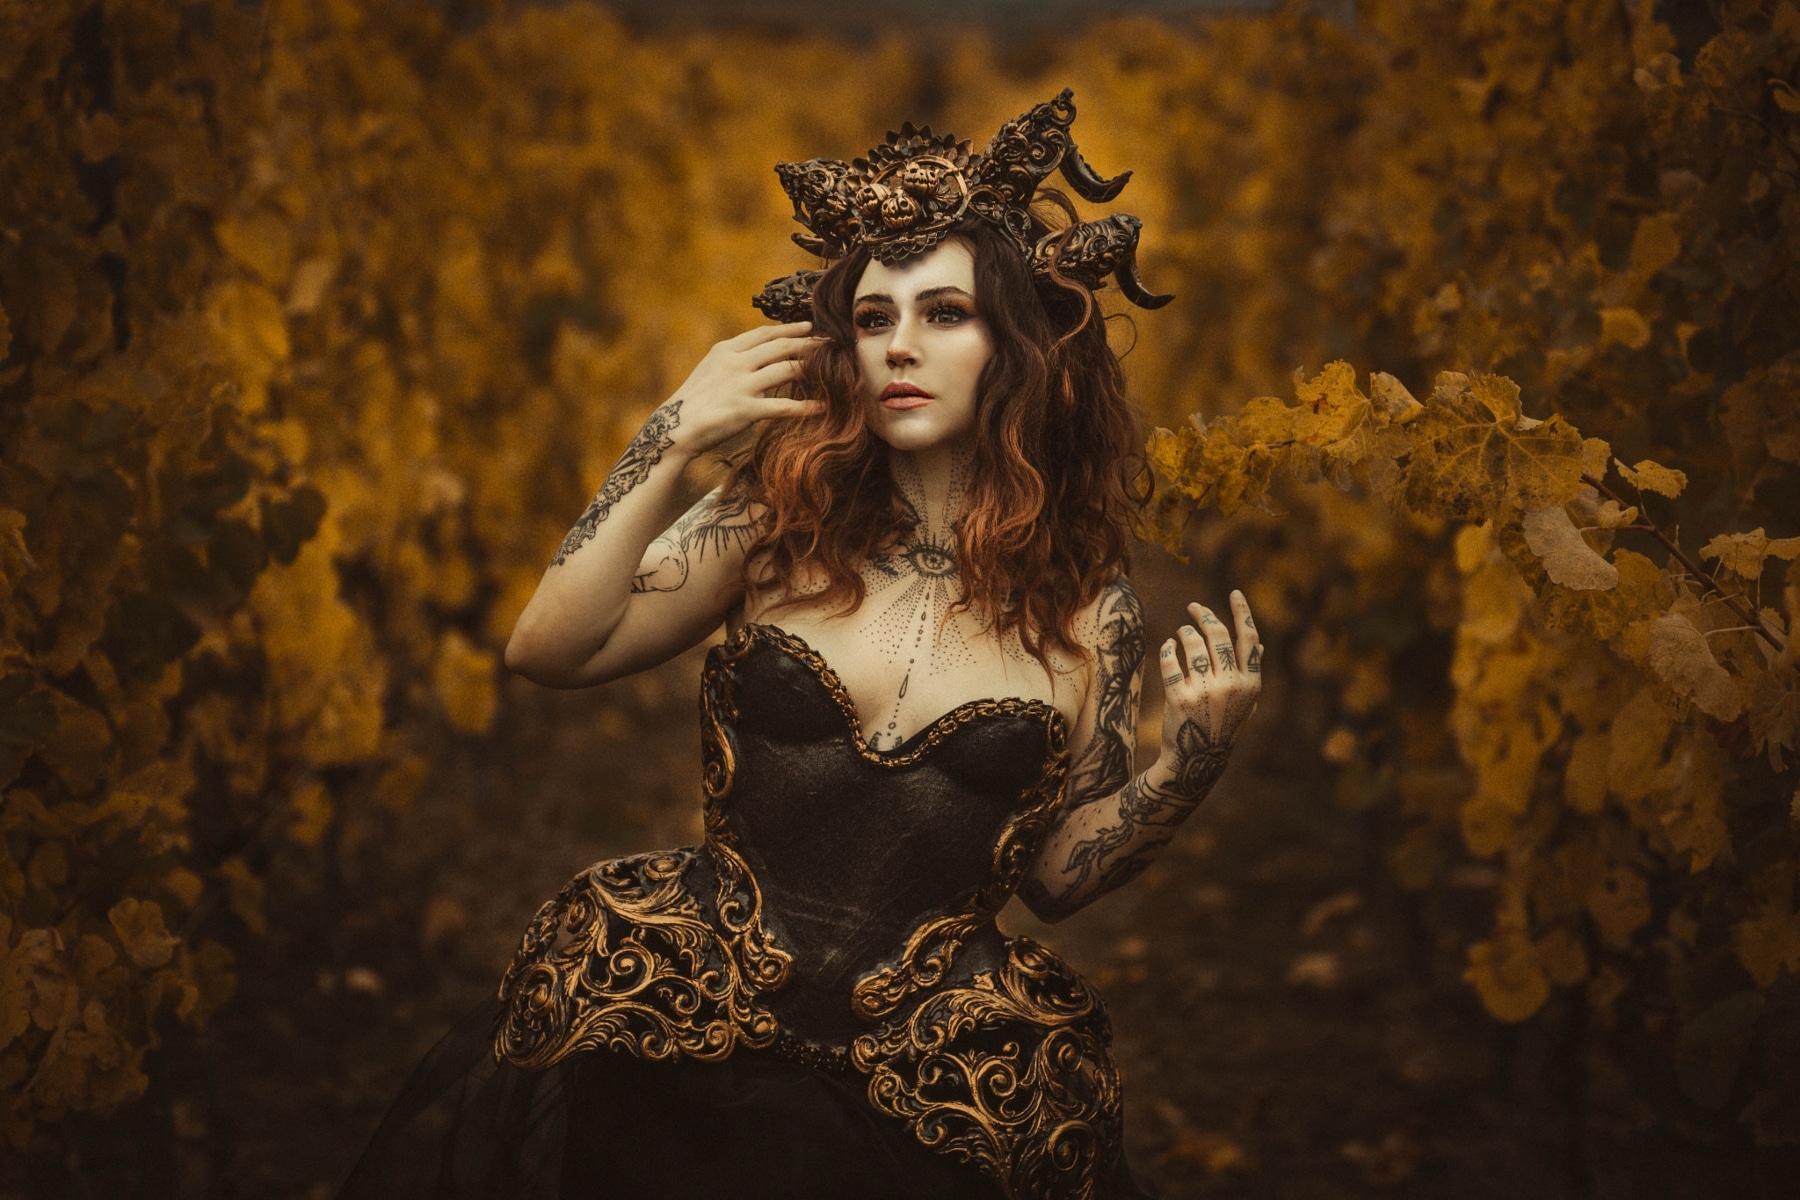 Vampirism as a Malevolent or Medical Source?